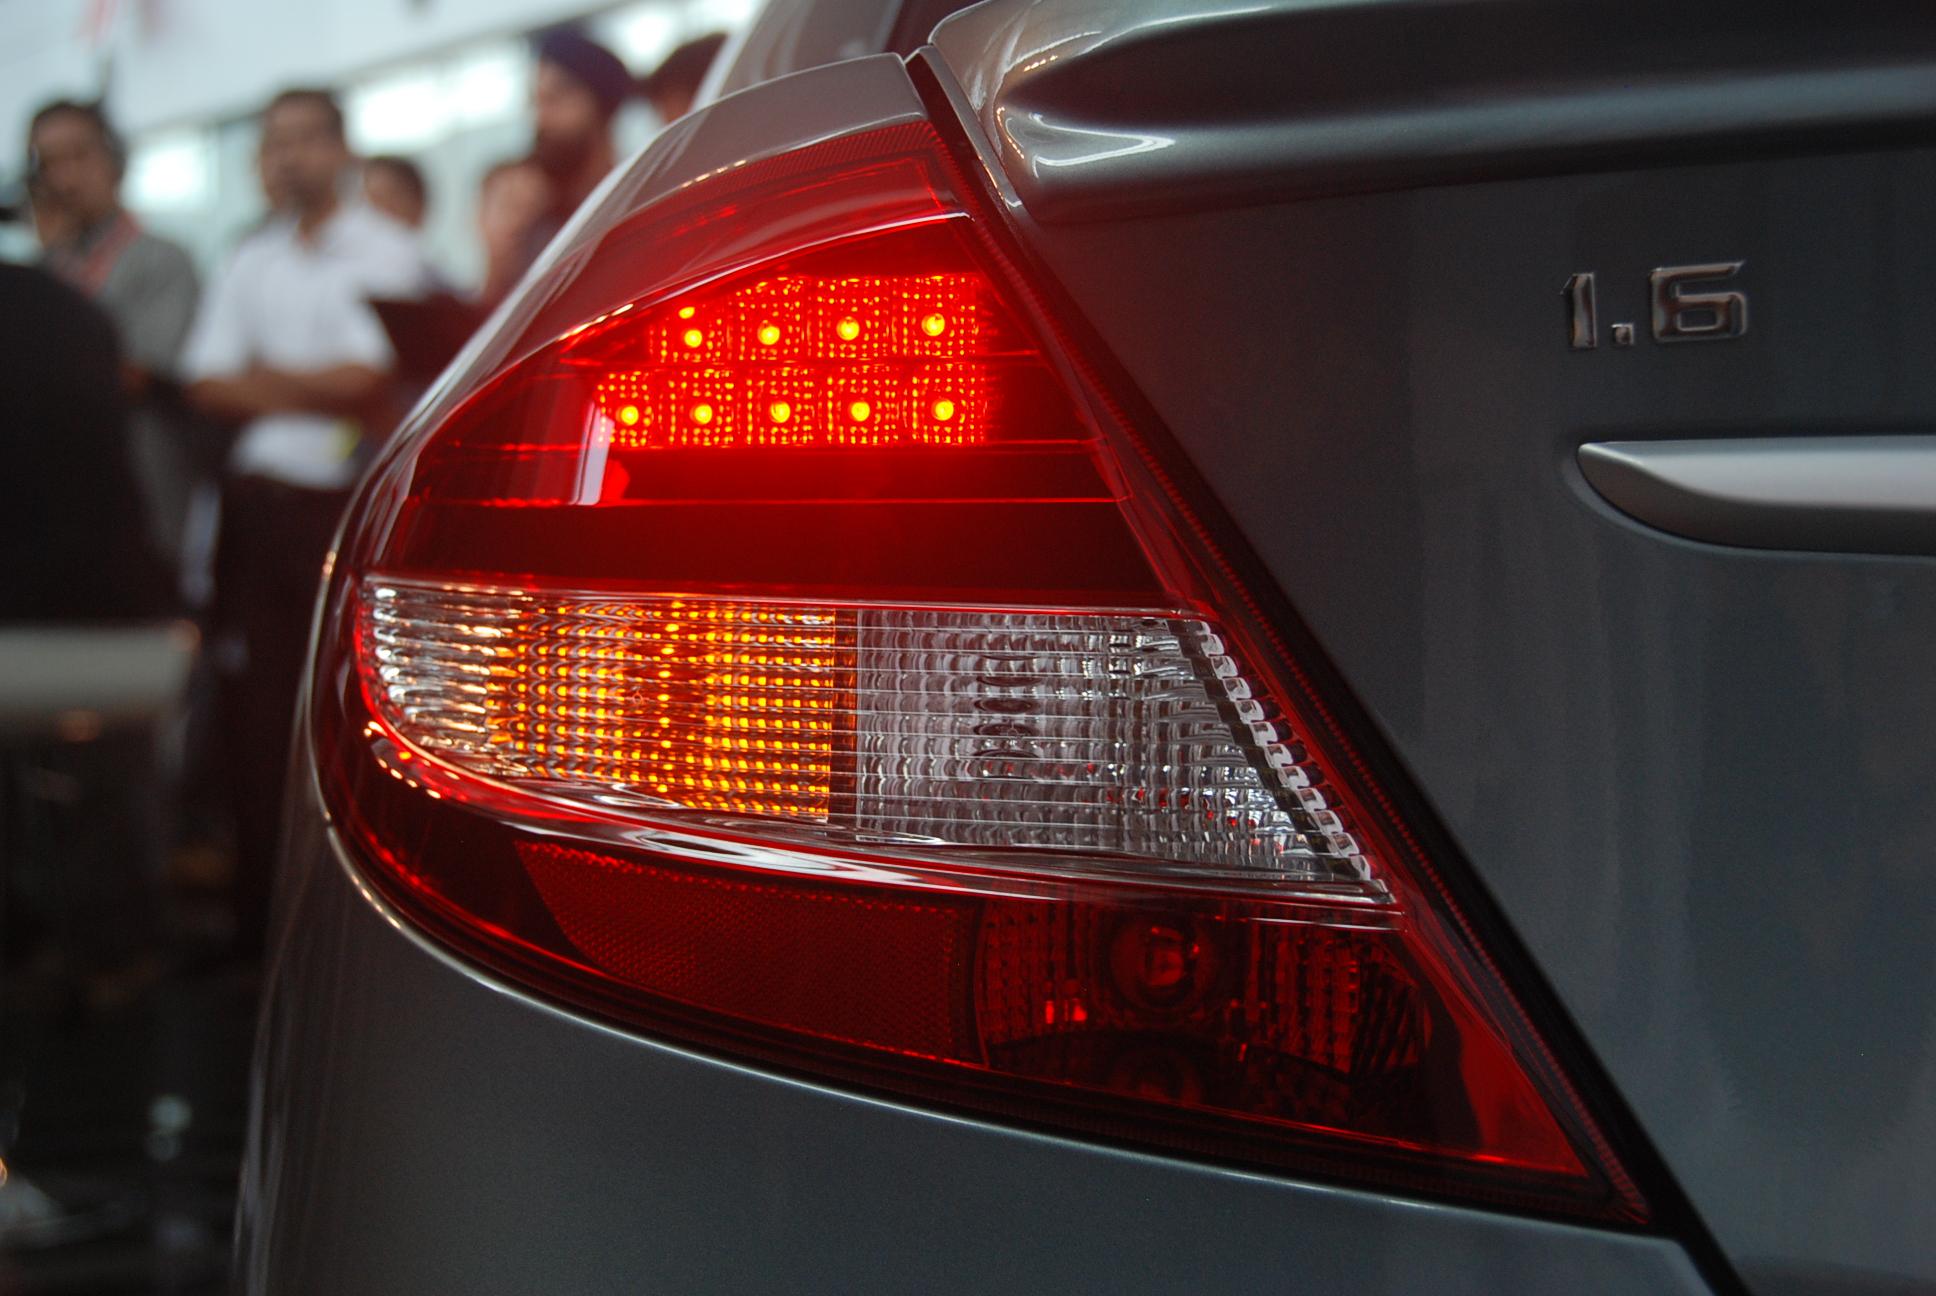 Amazing File:Proton Persona Elegance LED Tail Lamp